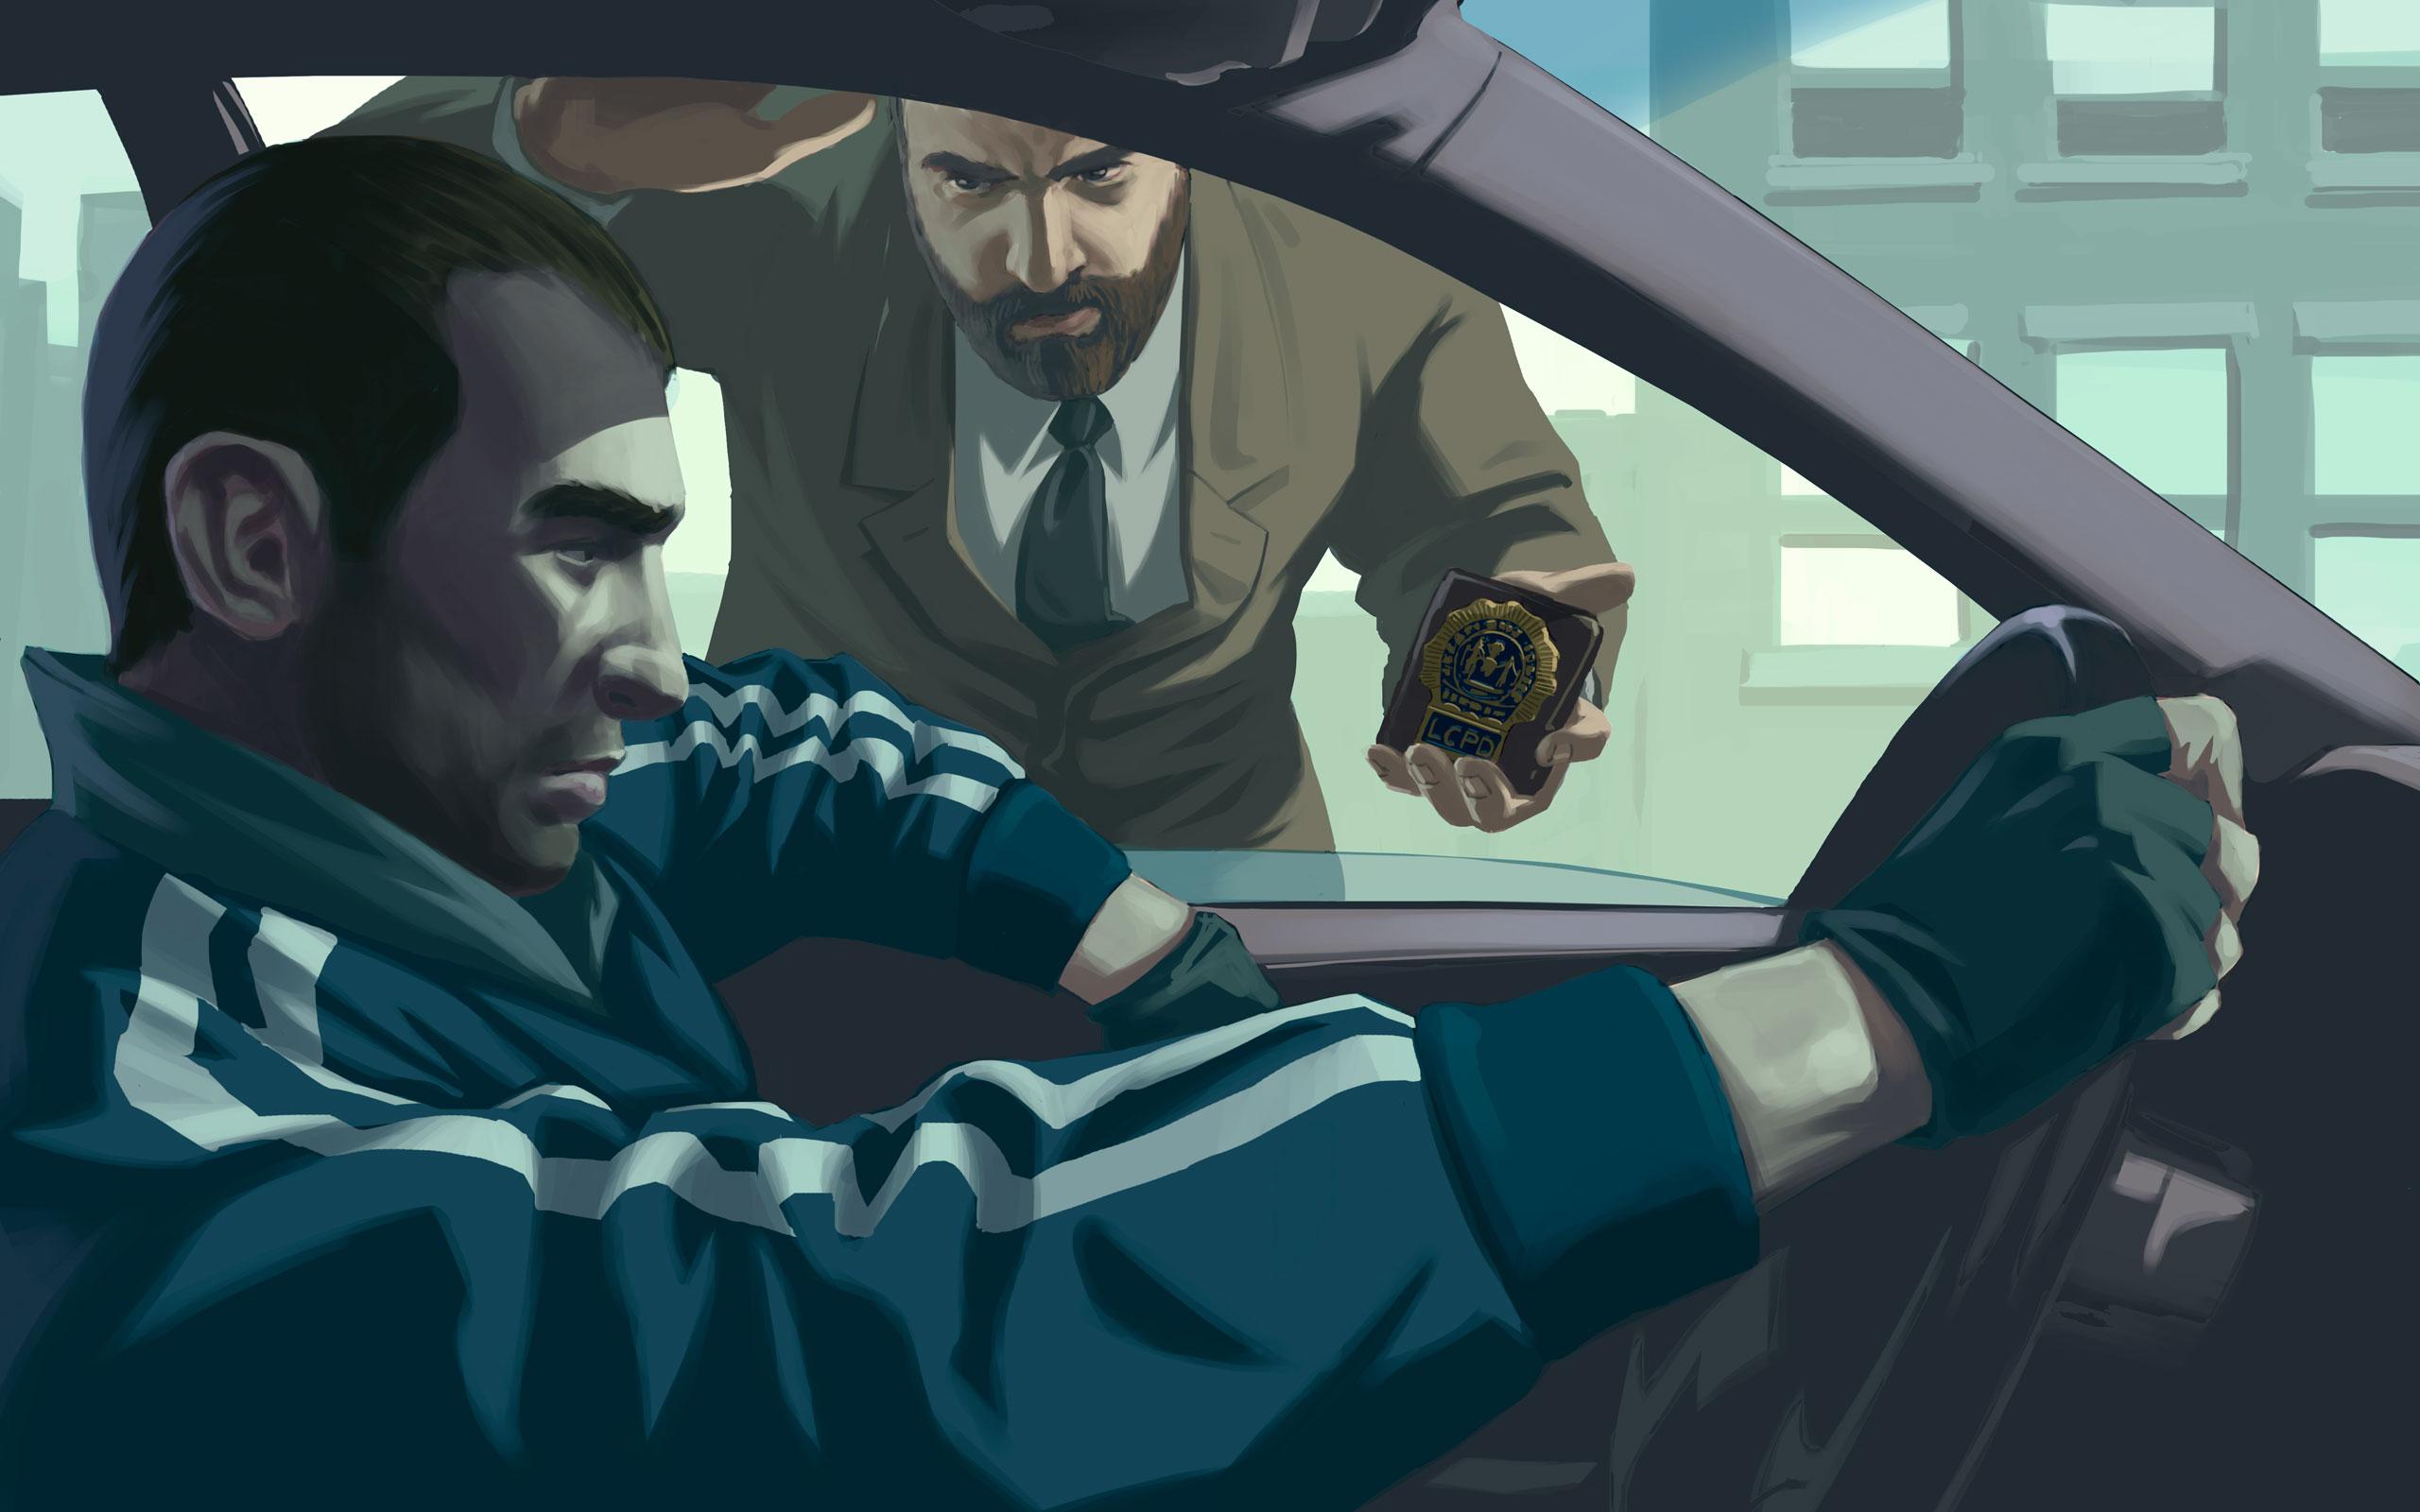 Artwork-Busted-GTA4.jpg